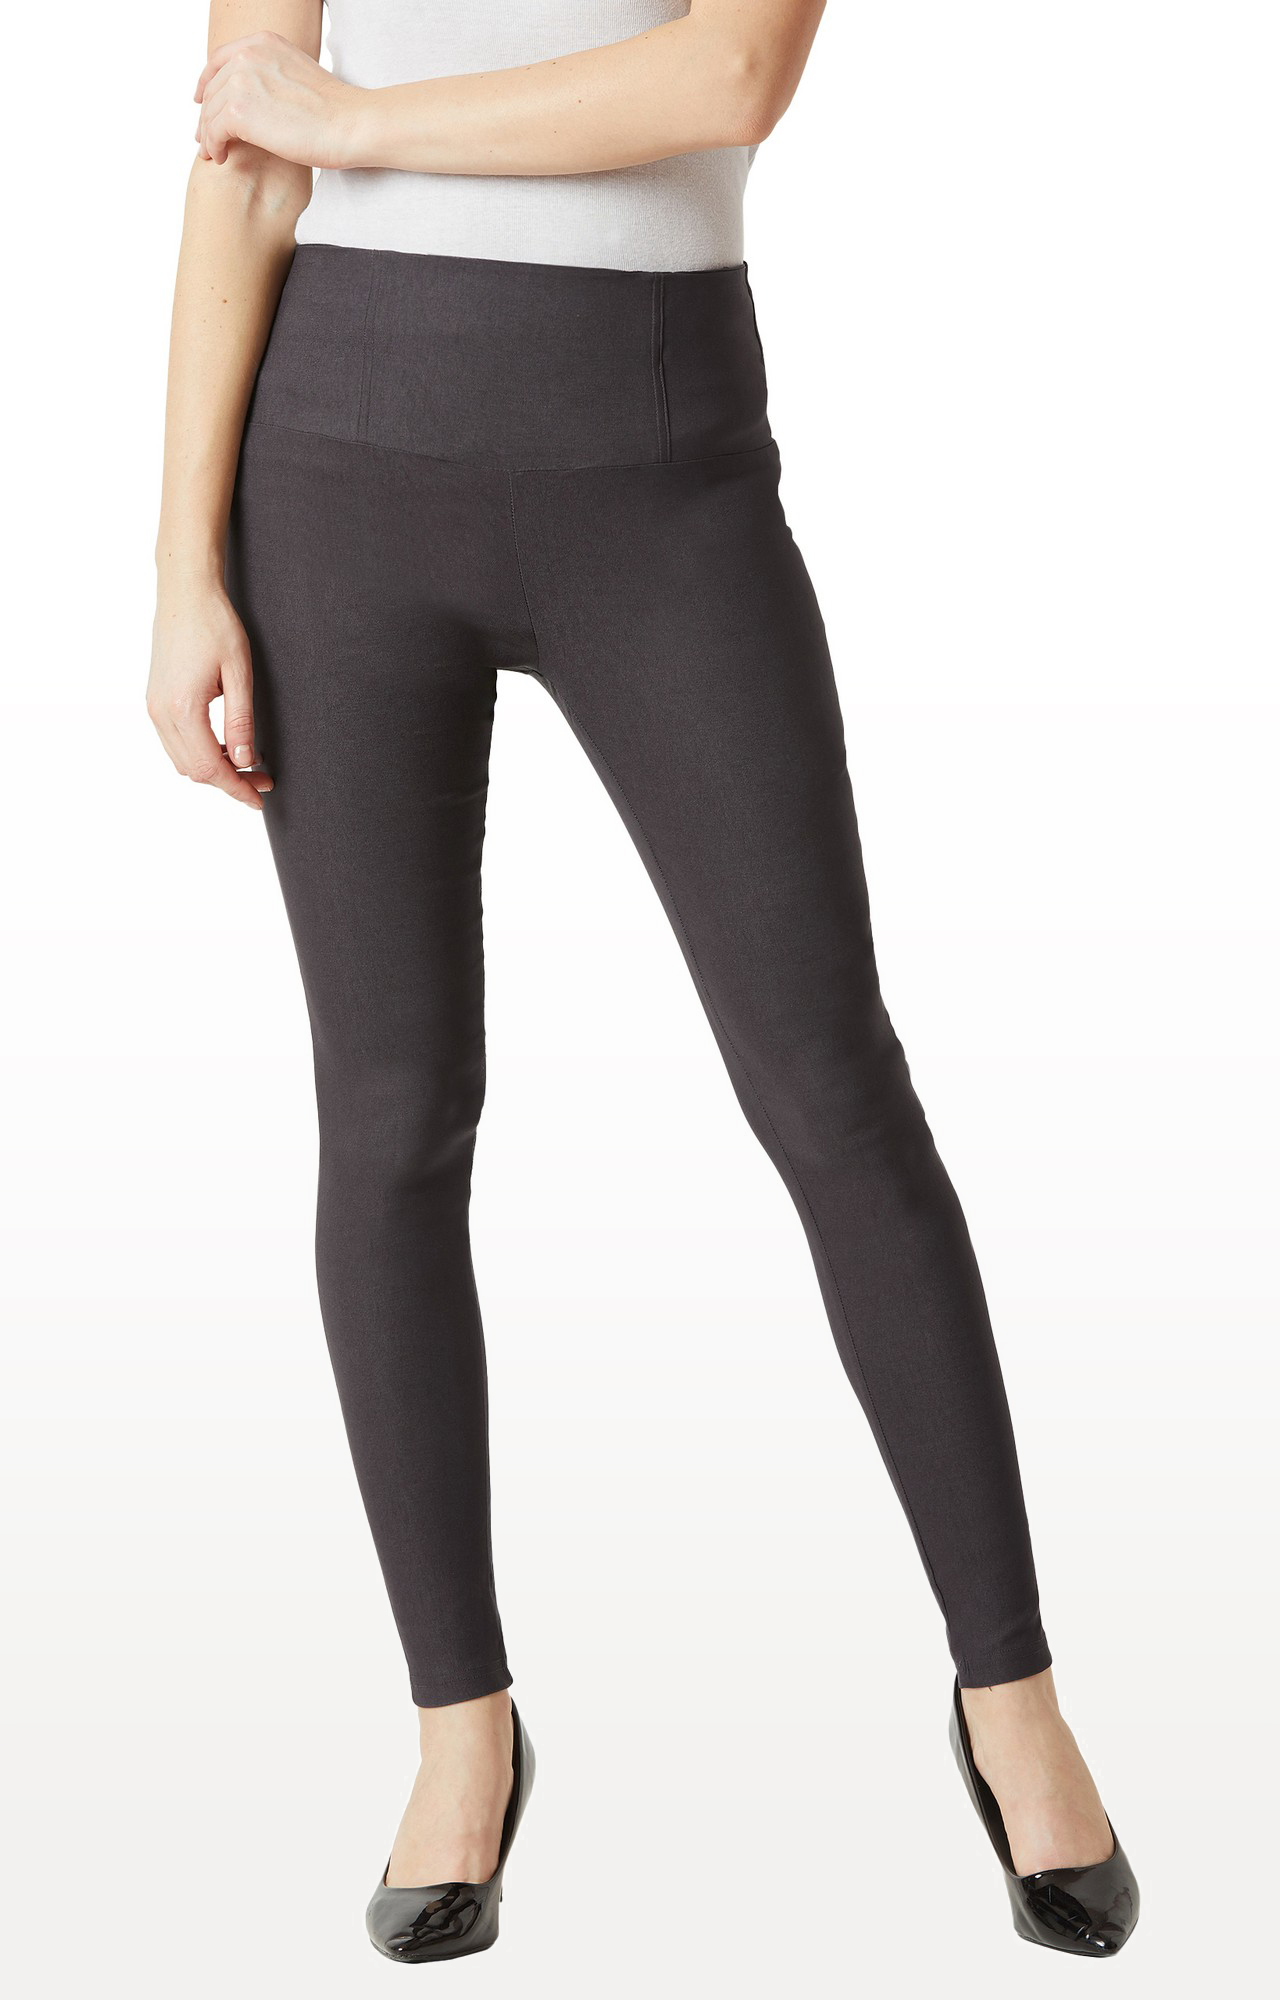 MISS CHASE | Dark Grey Solid High Waist Regular Length Patch Pocket Jeggings